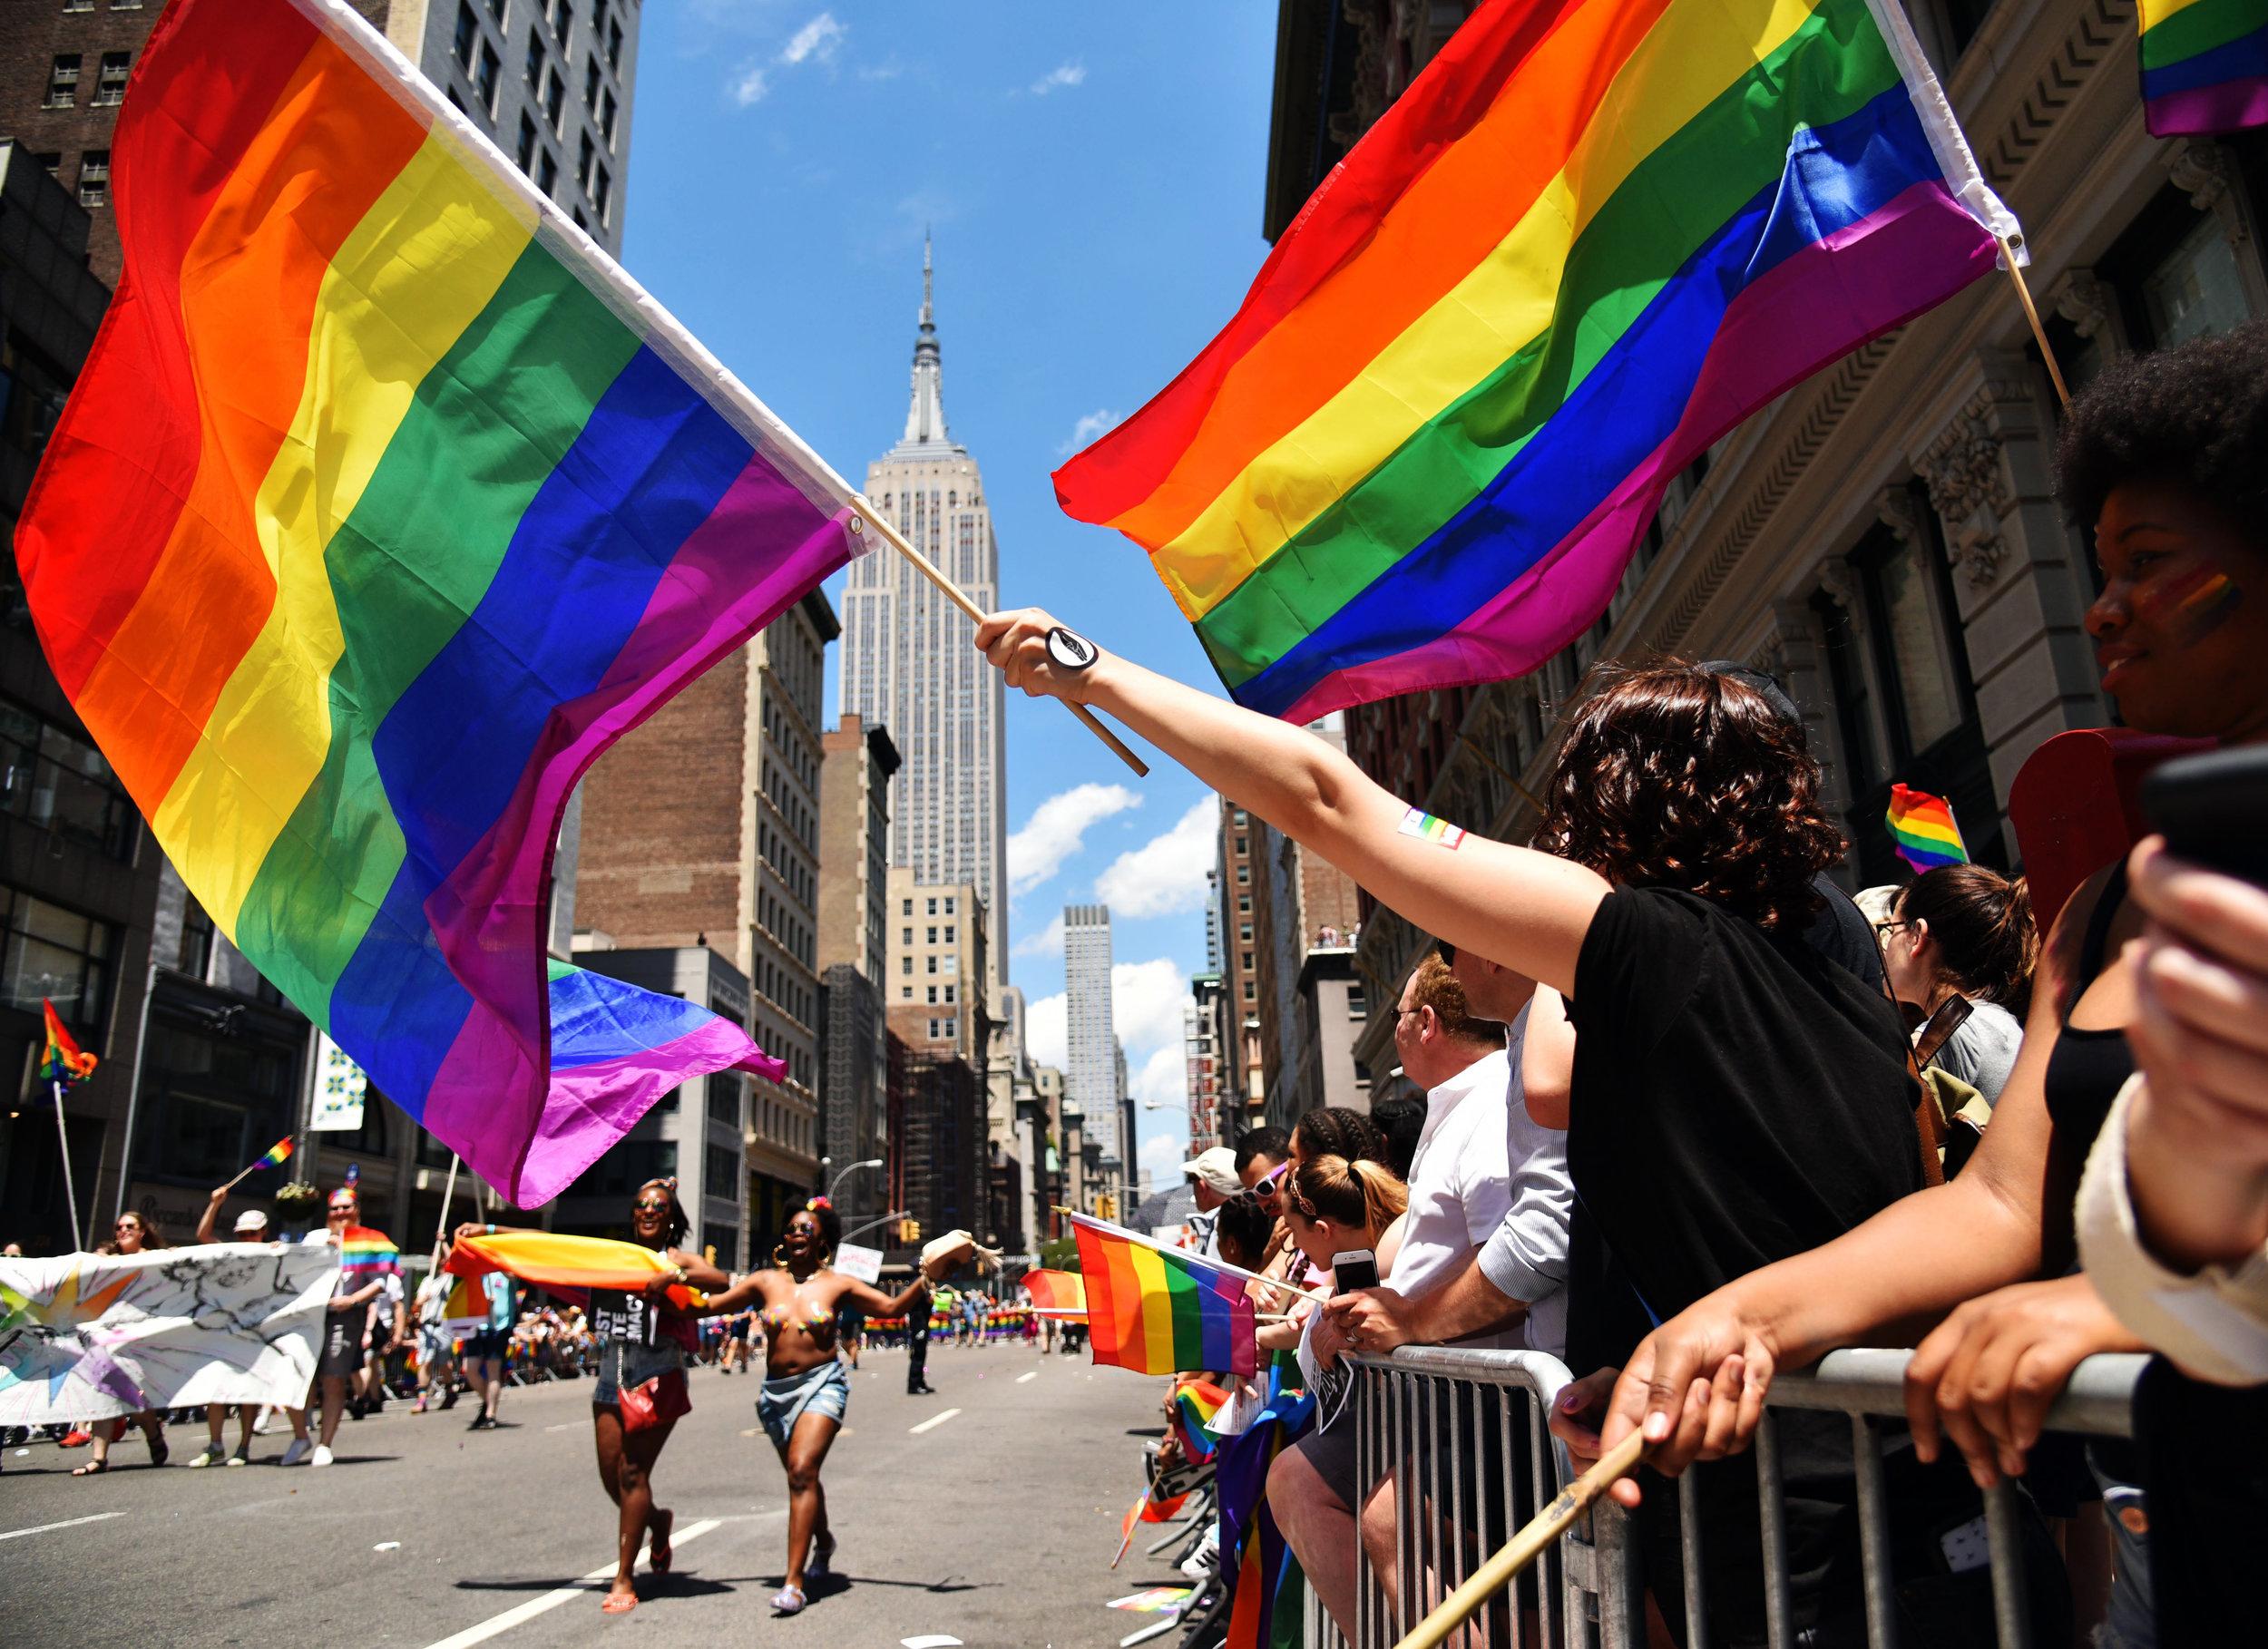 straight-people-at-lgbtq-pride-parade-14e2143a-b2dd-4662-8153-a7be98ed9484.jpg